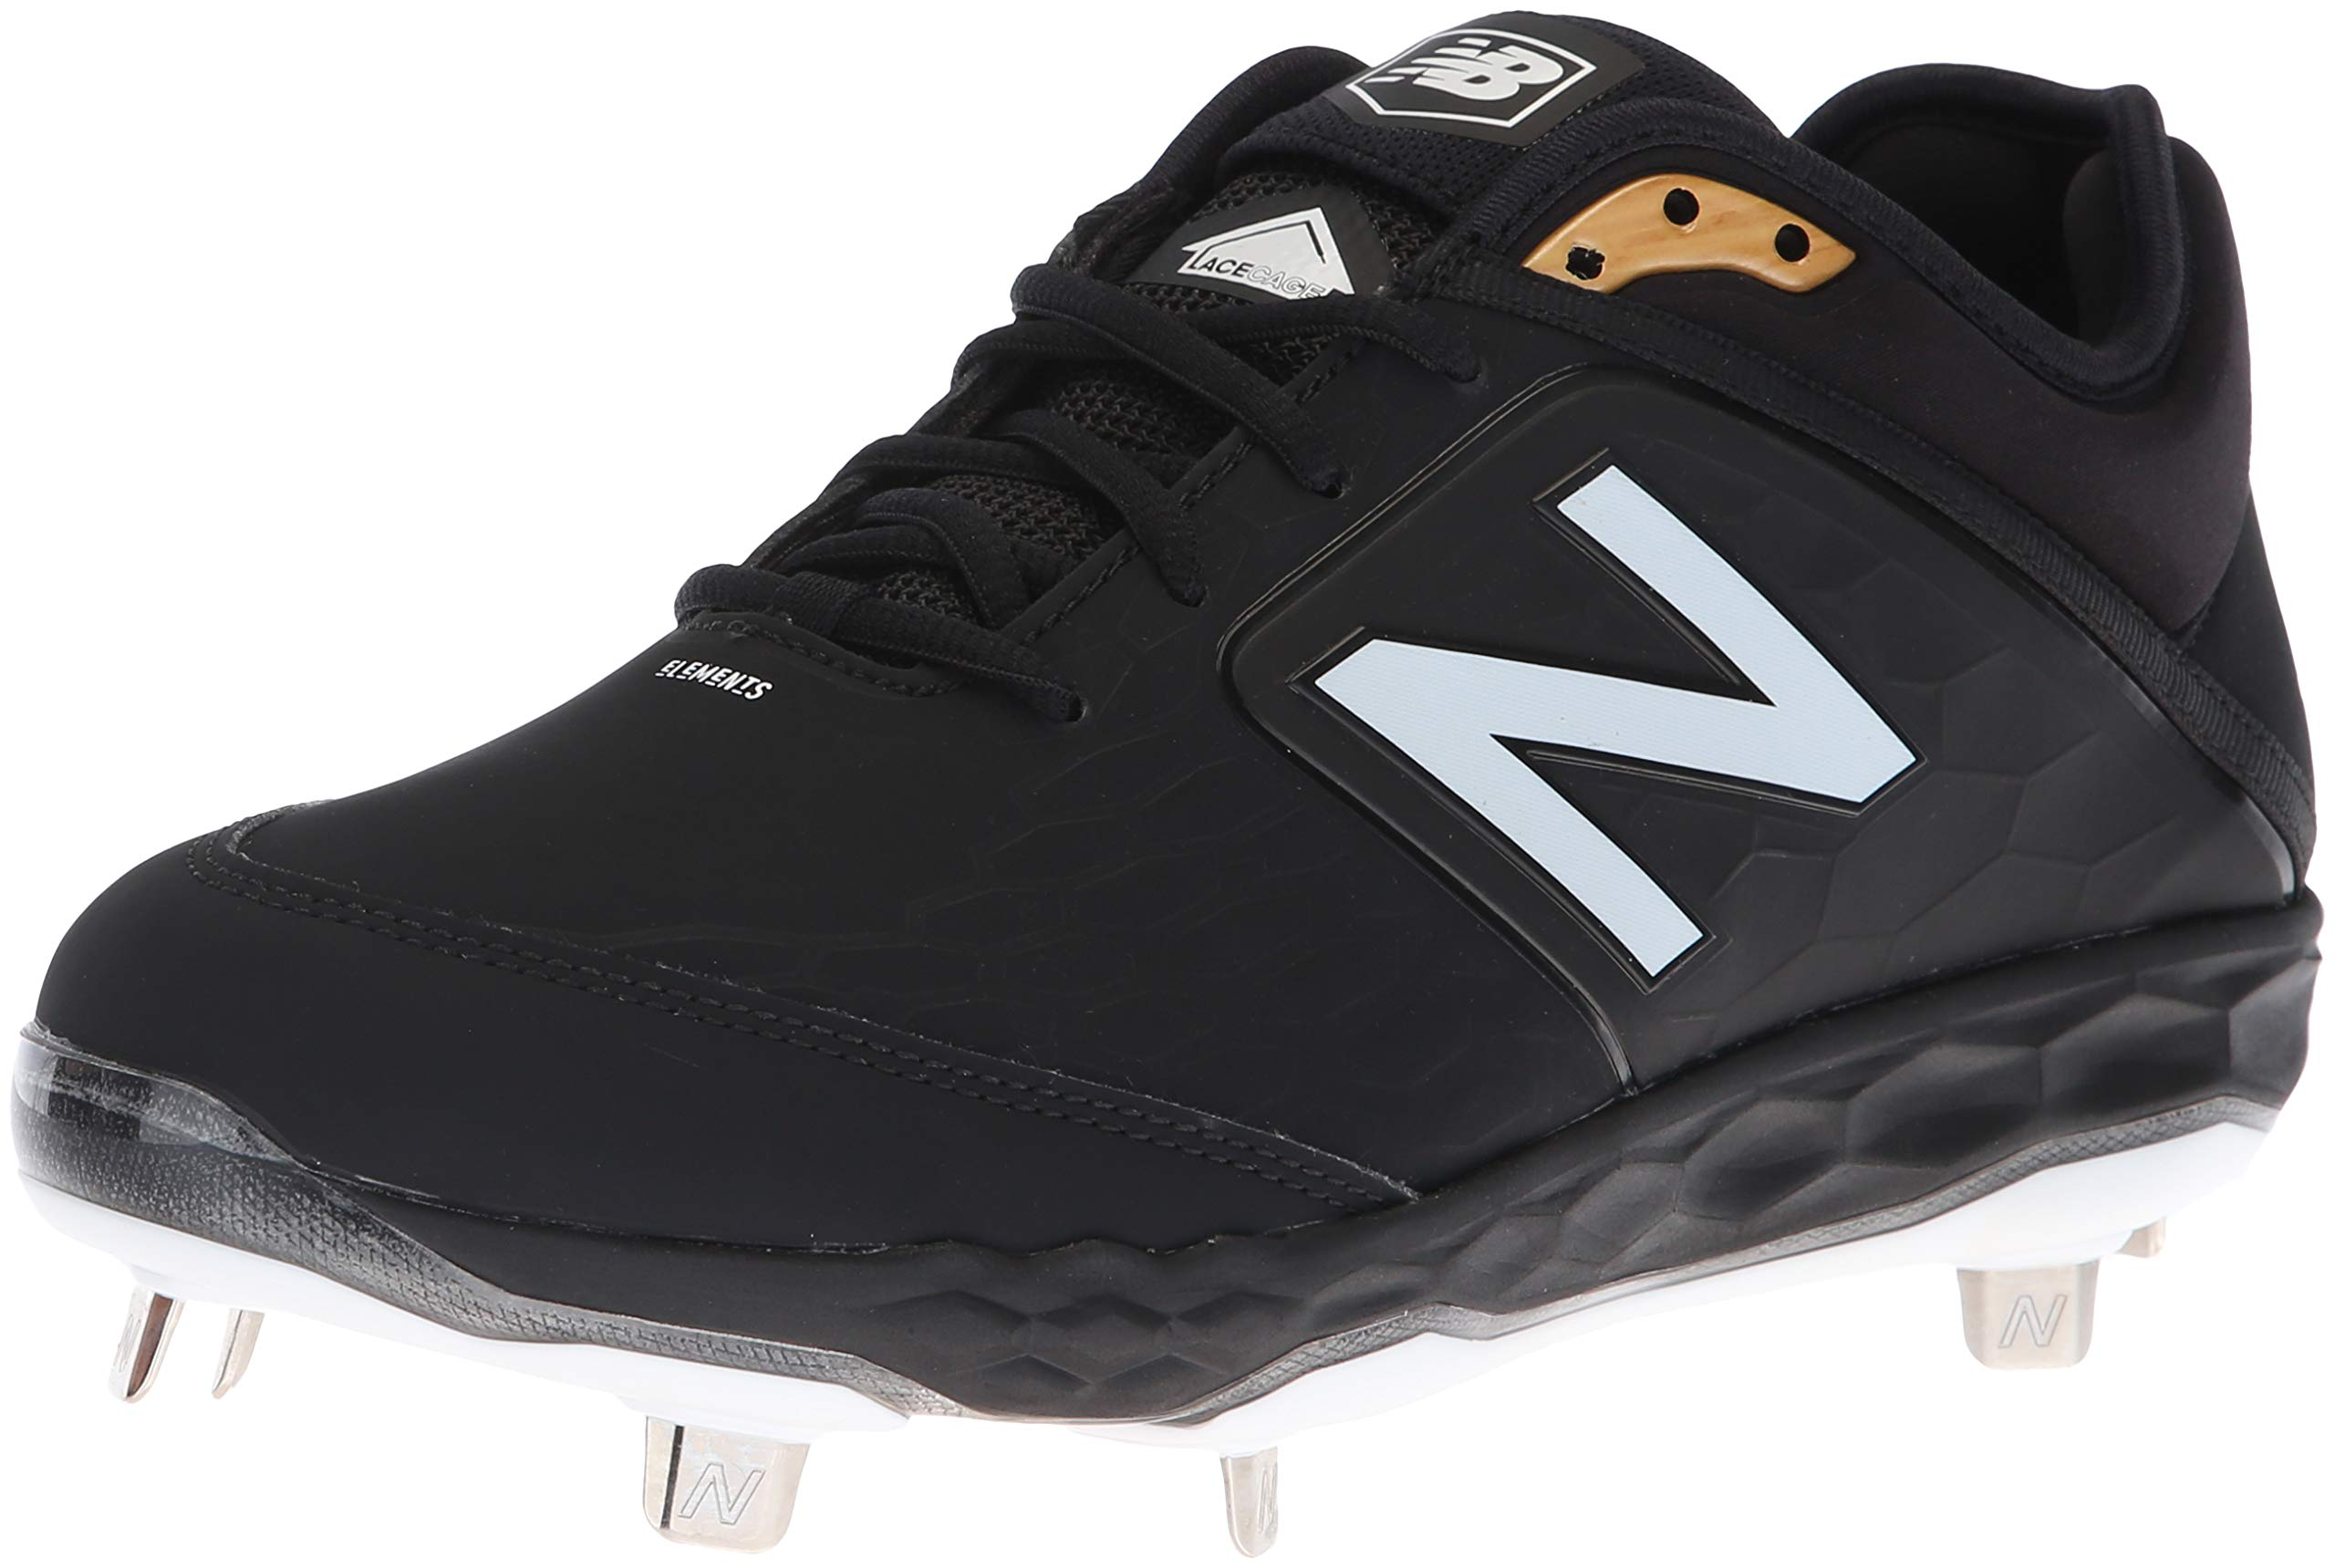 New Balance Men's 3000v4 Baseball Shoe, Black, 5 2E US